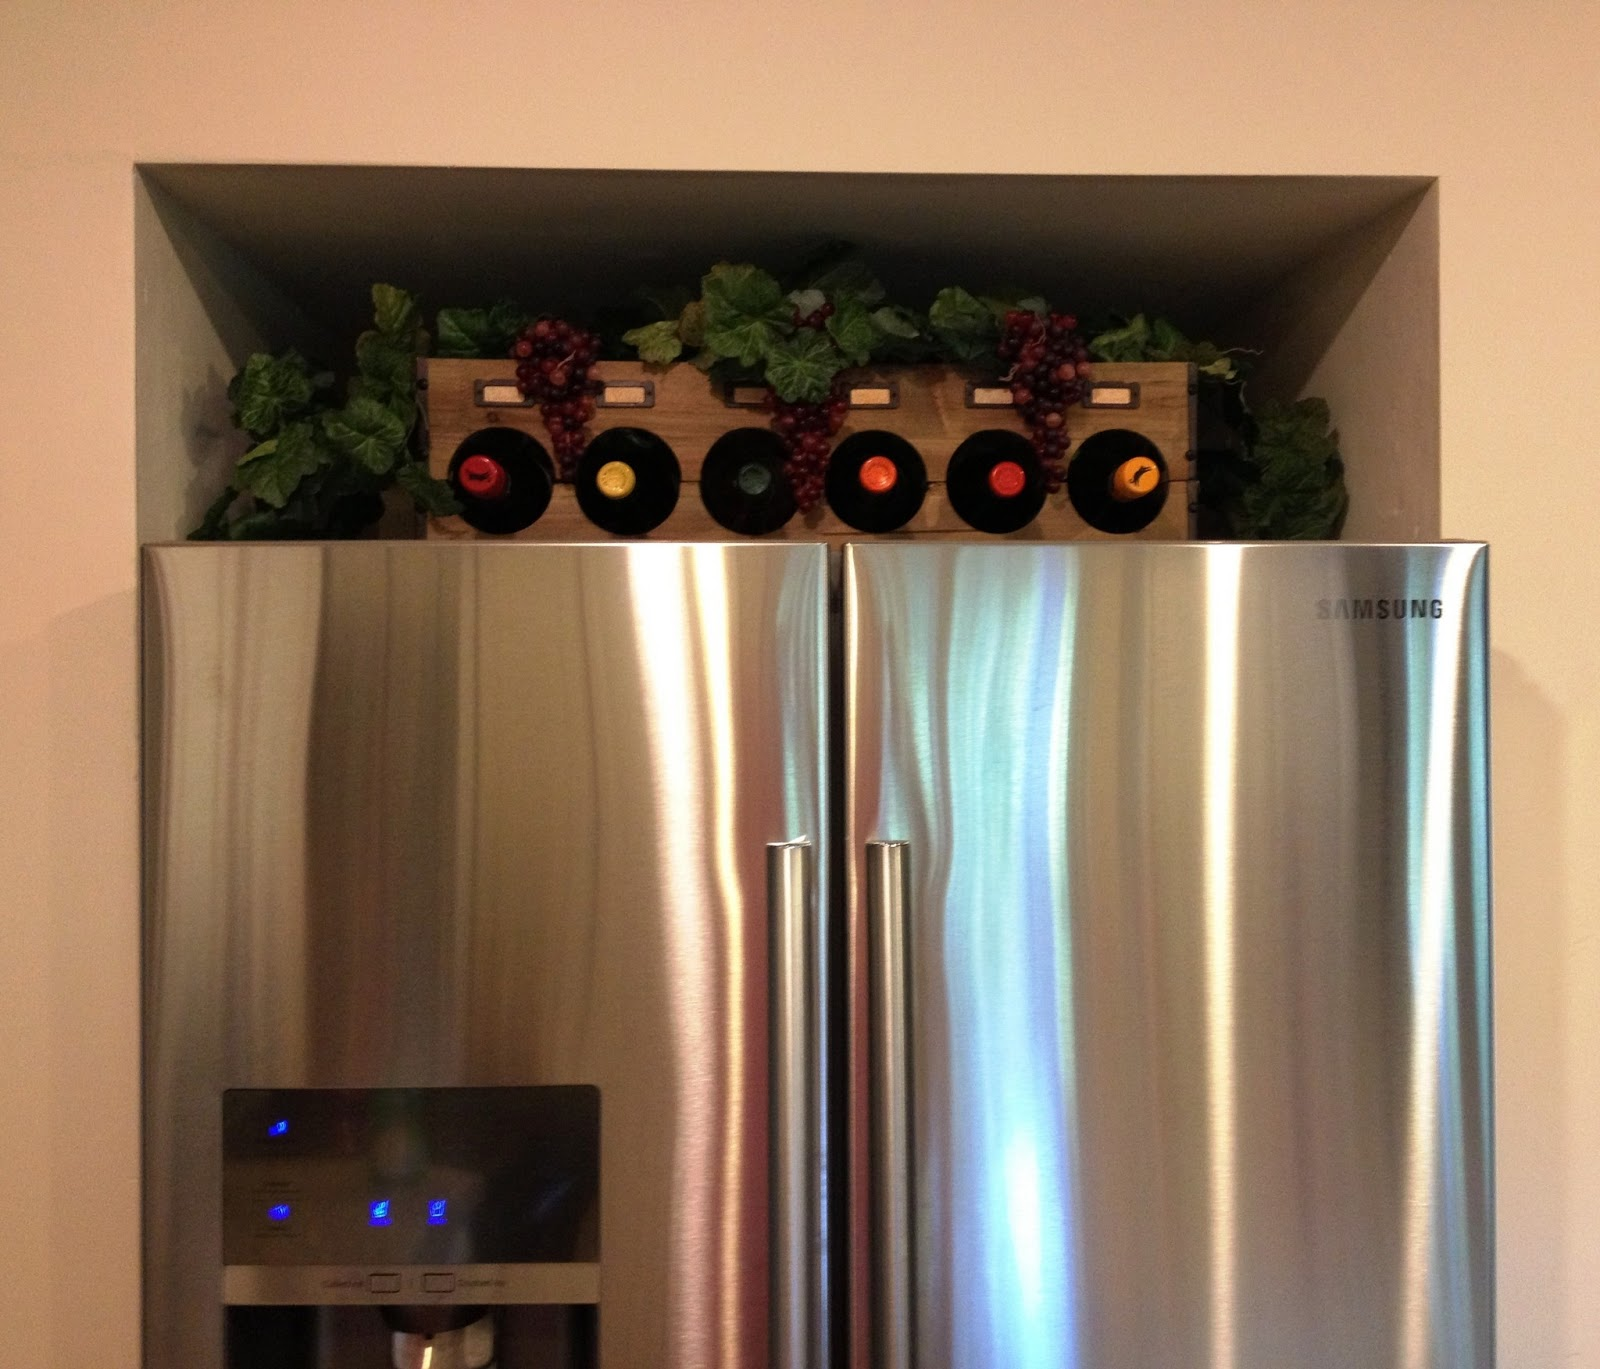 Top of refrigerator decor euffslemani top of refrigerator decor home decorating ideas publicscrutiny Choice Image